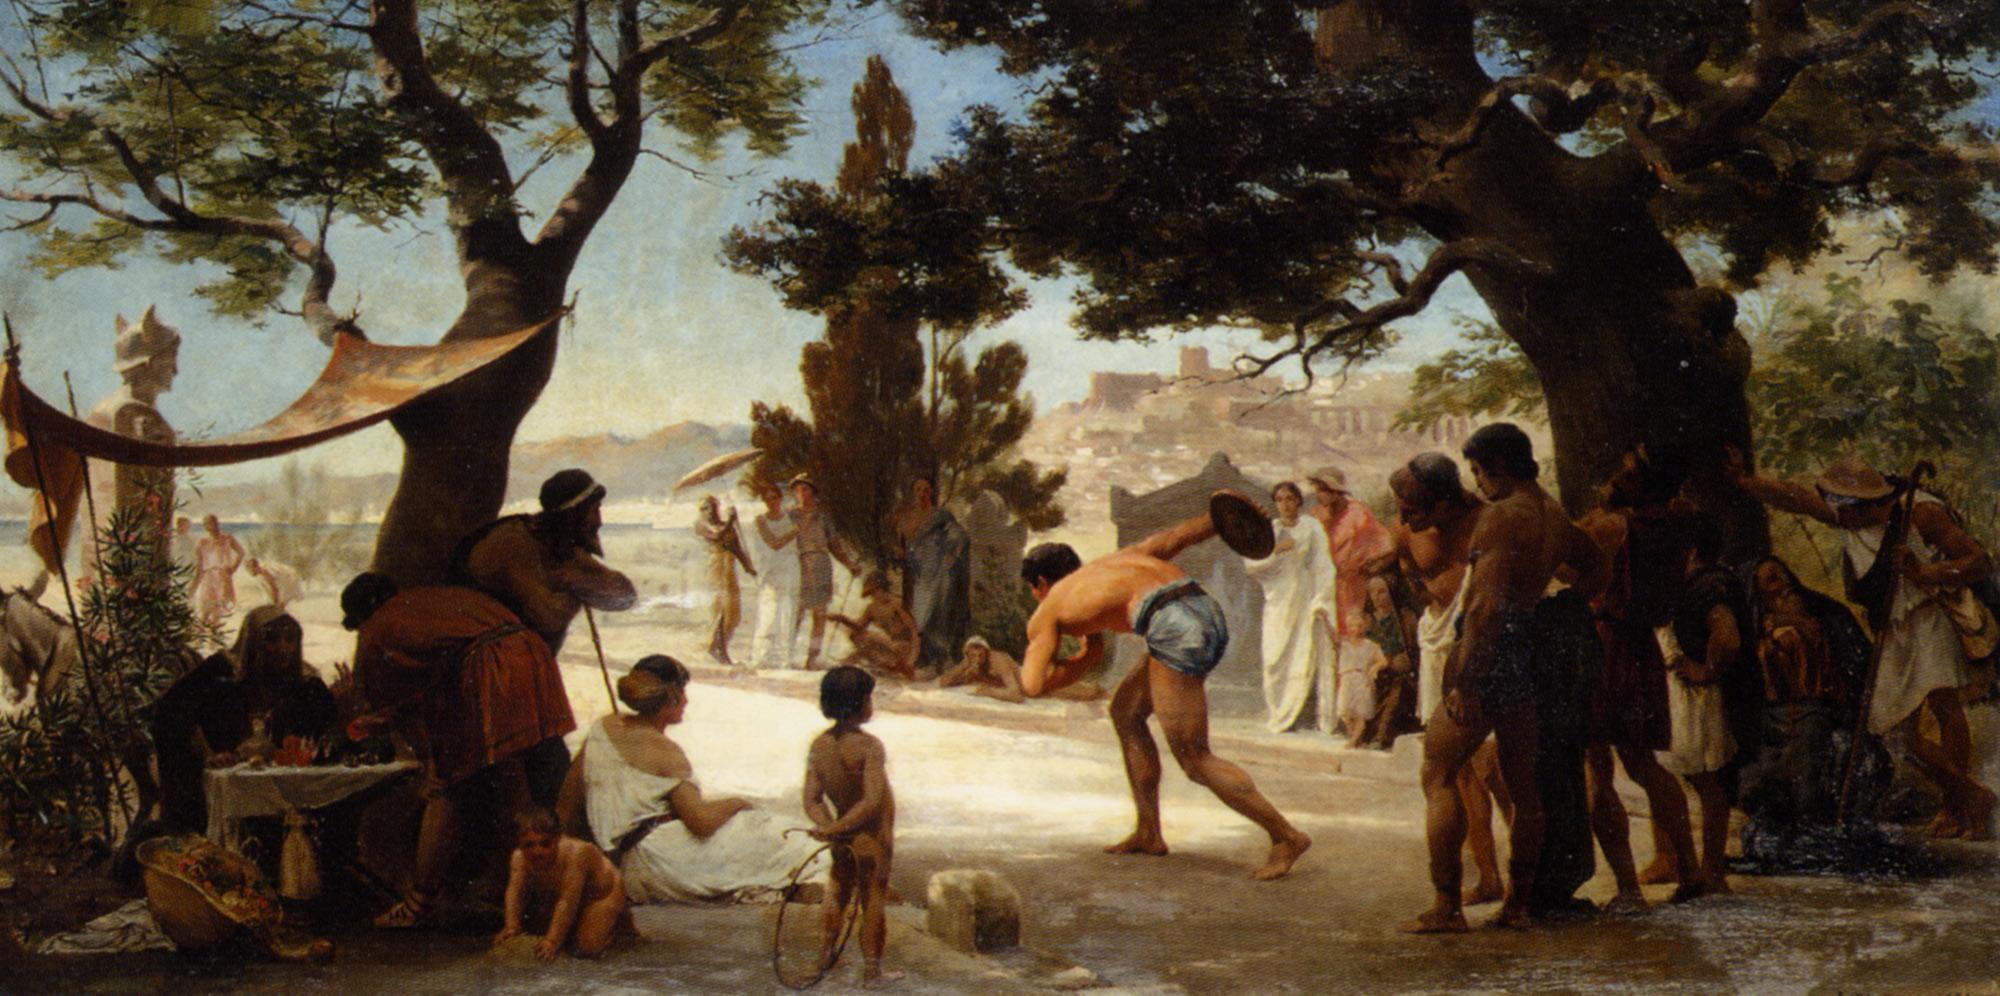 The Discus Thrower :: Edouard Dantan - Antique world scenes ôîòî